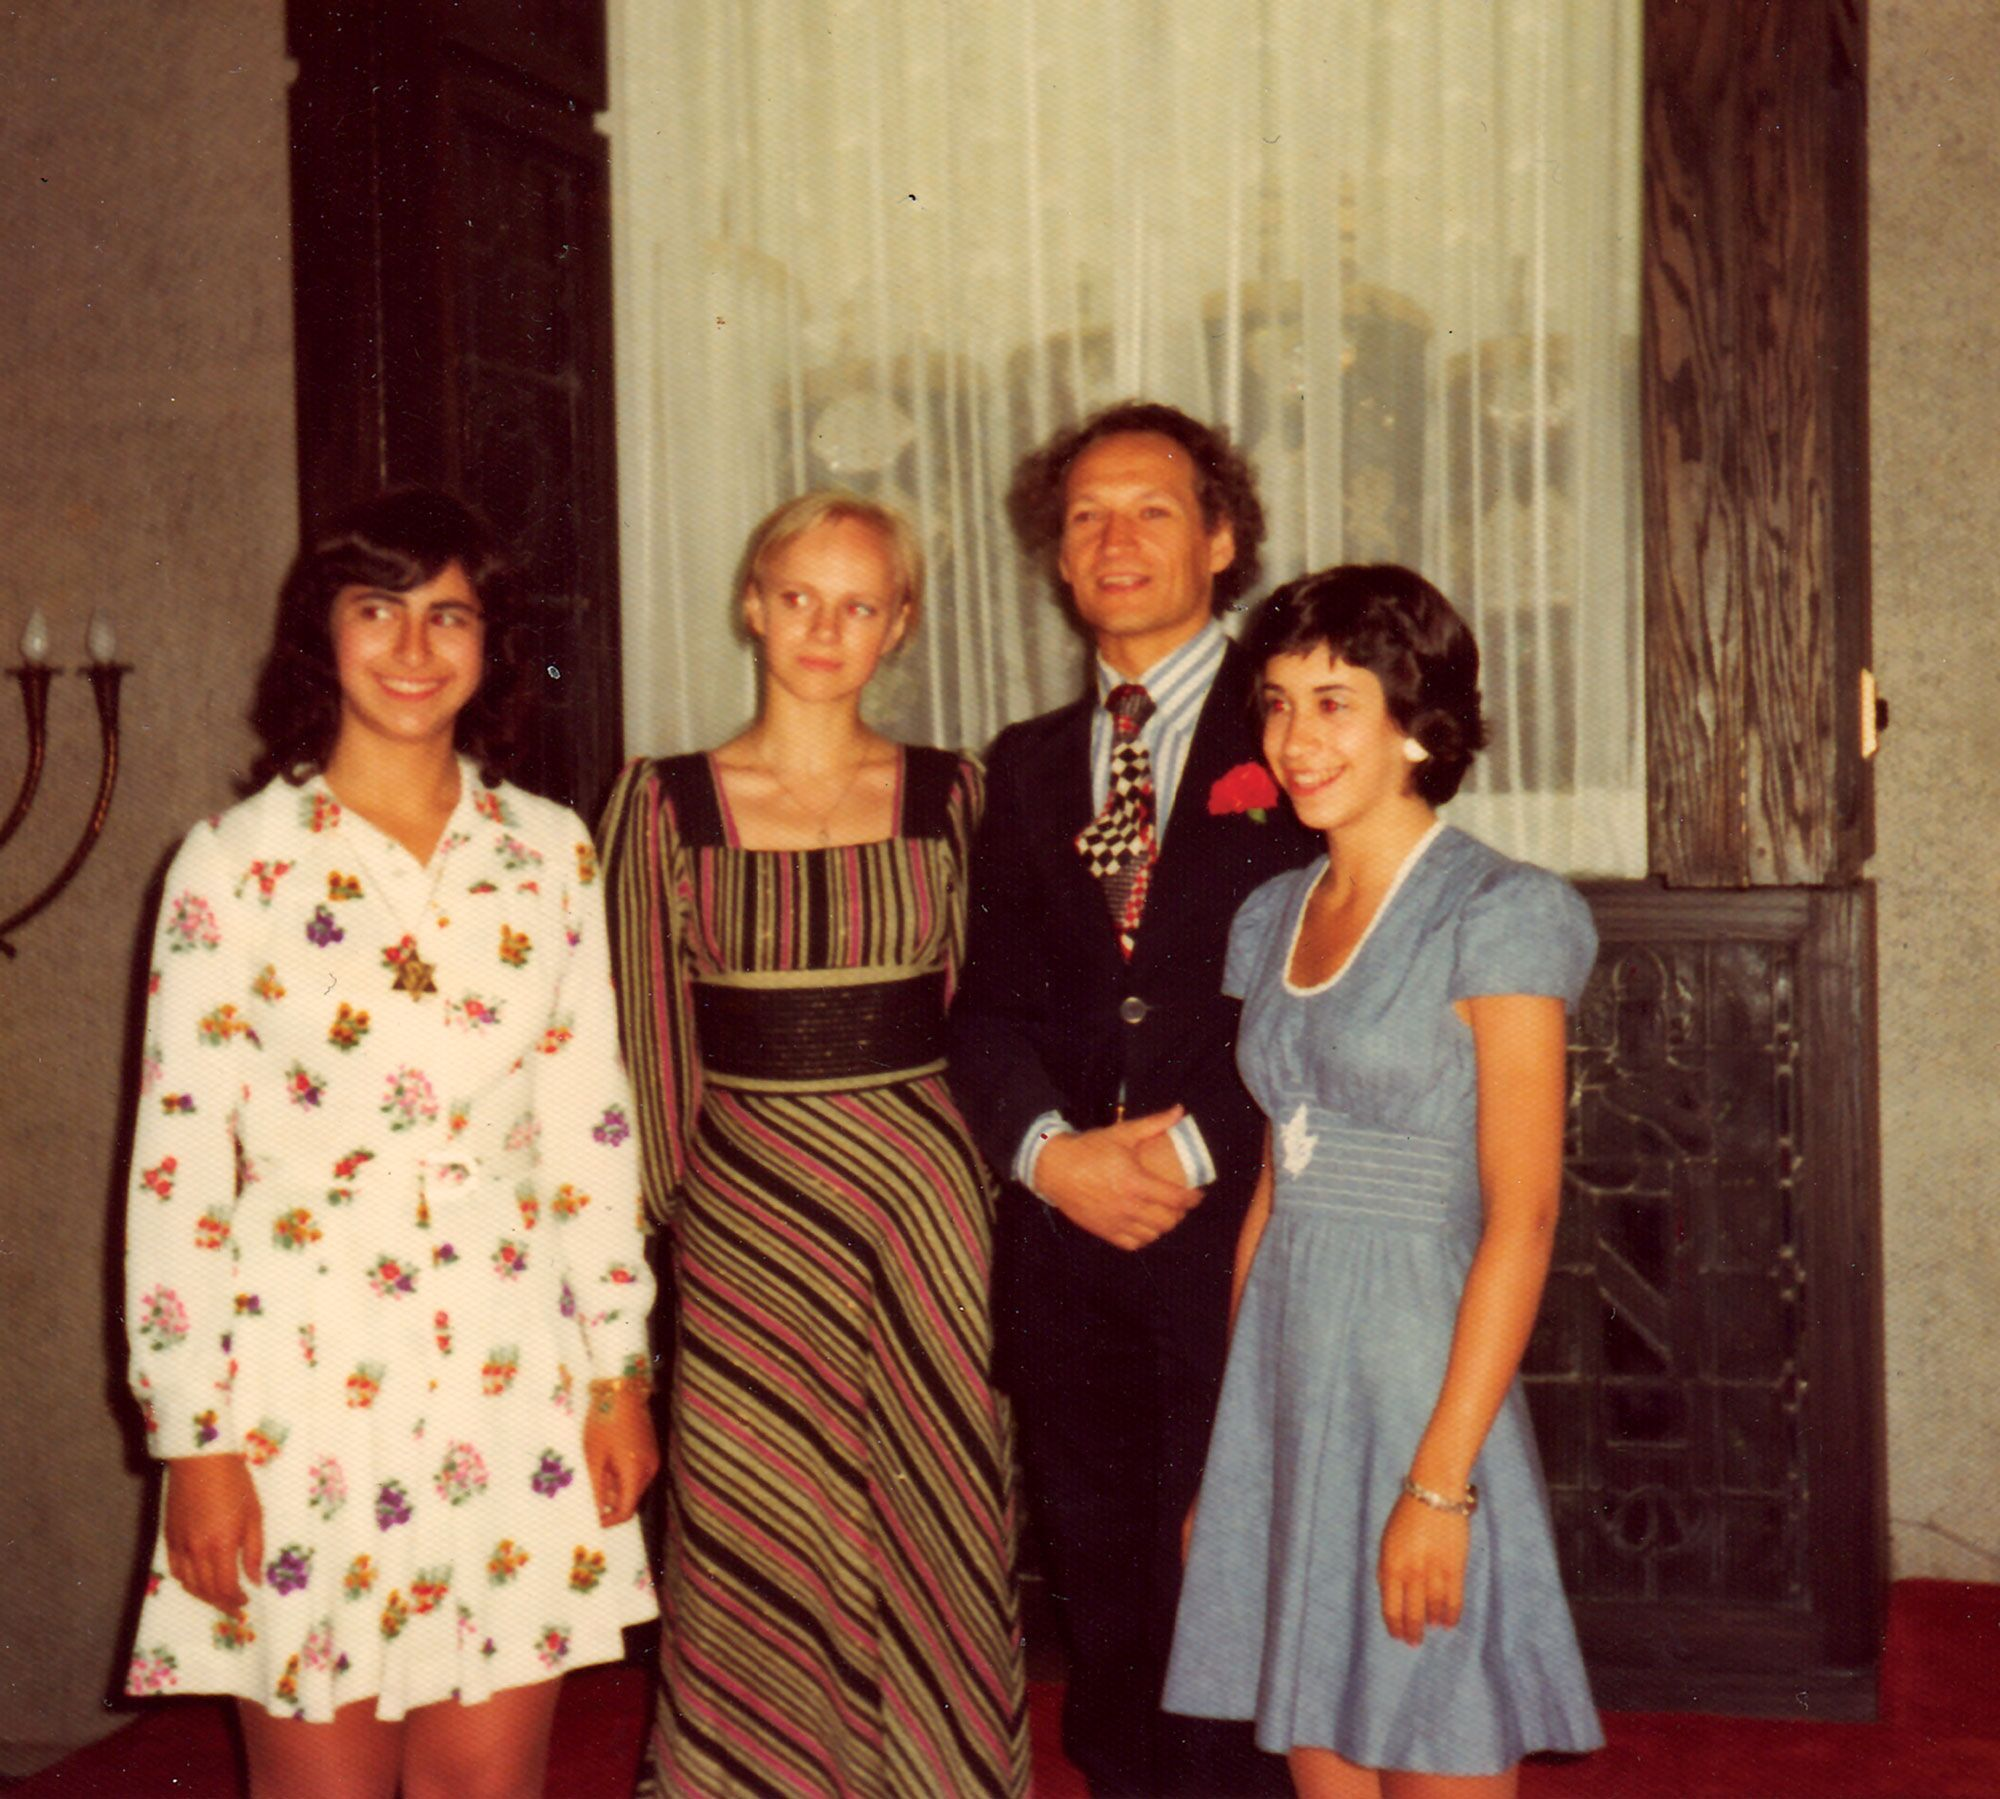 L-R: Beth Huppin, Galina Panova, Valery Panov, Lisa Low